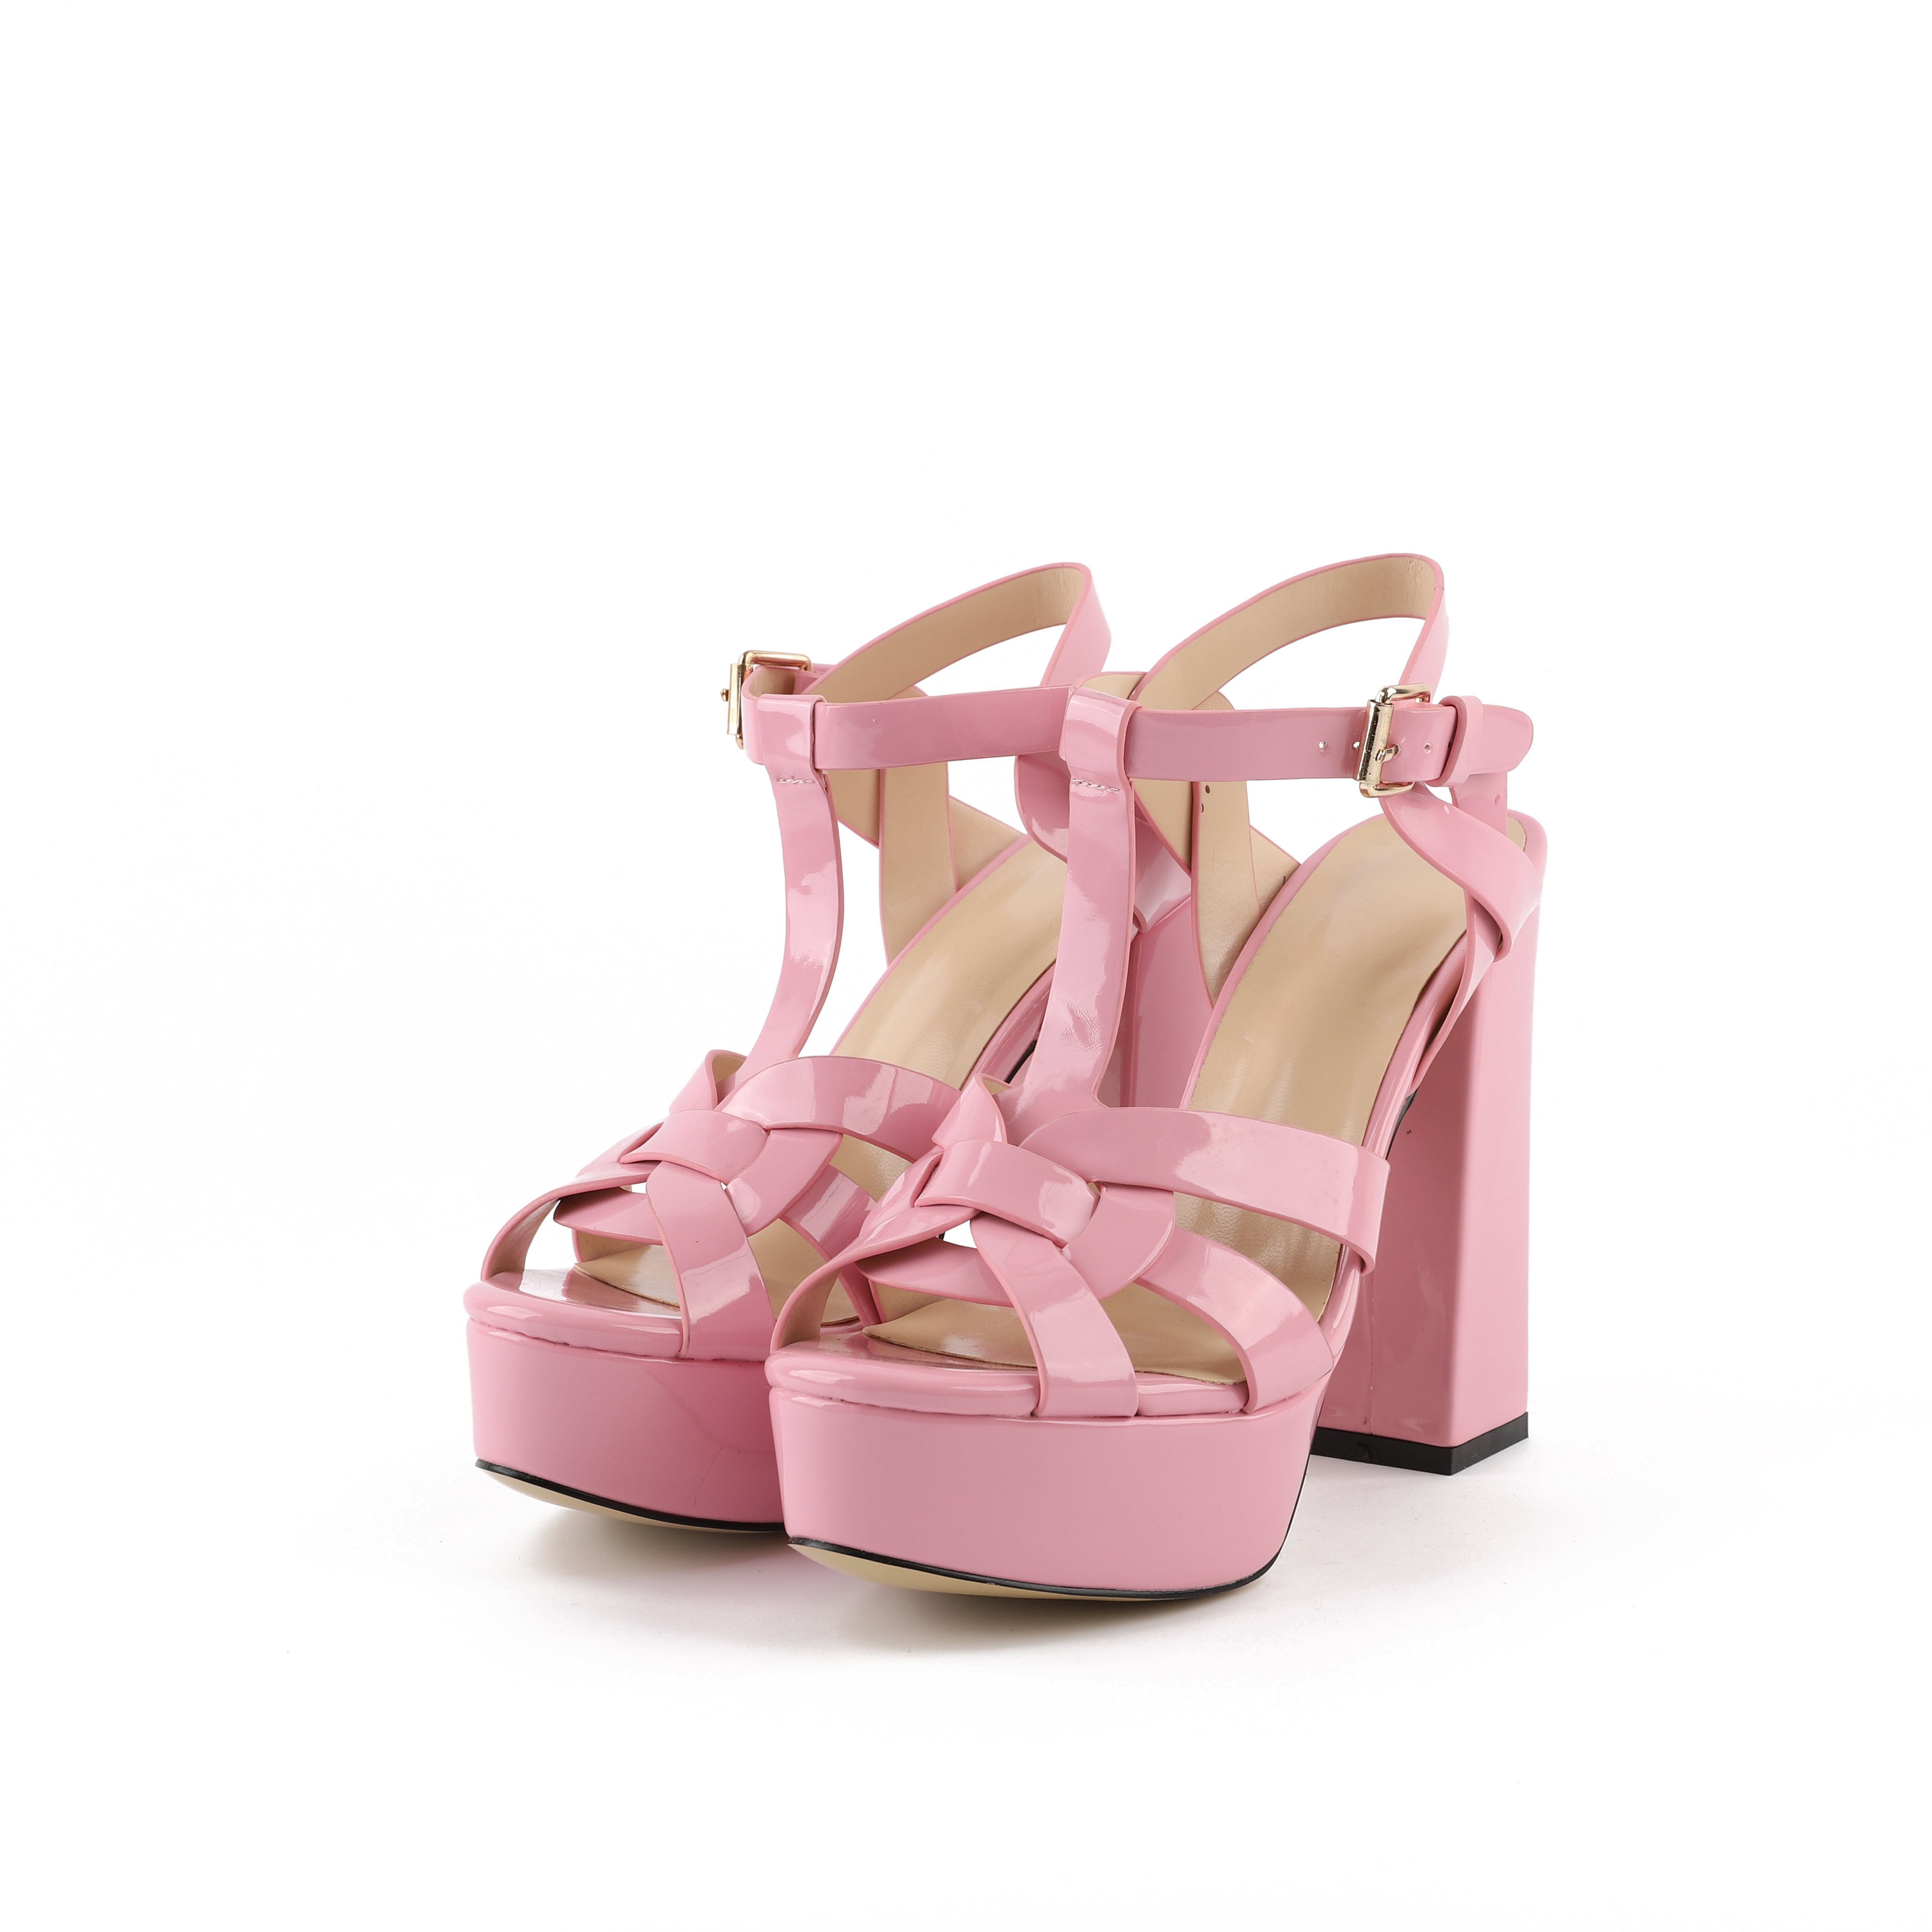 f3ed52fc49e7 US  49 - Arden Furtado summer high heels 12cm platform peep toe chunky  heels pink fashion casual sandals shoes for woman T-strap -  www.ardenfurtado.com